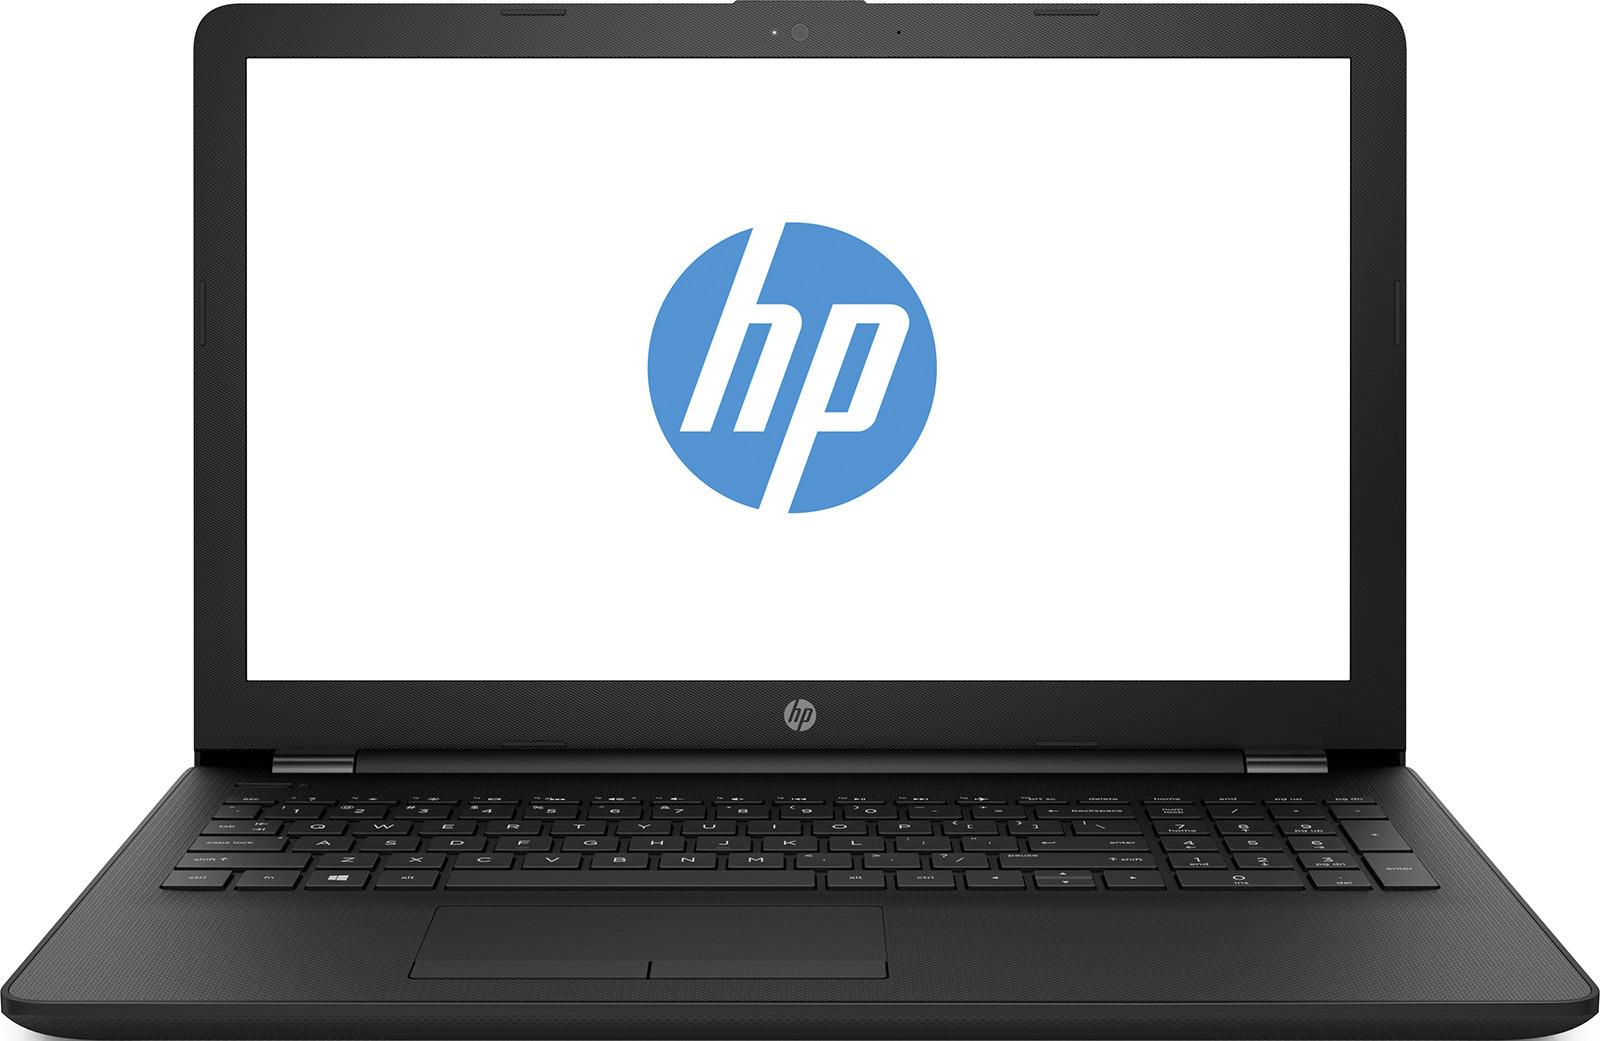 Ноутбук HP 15-bw018ur, 1ZK07EA, 15,6